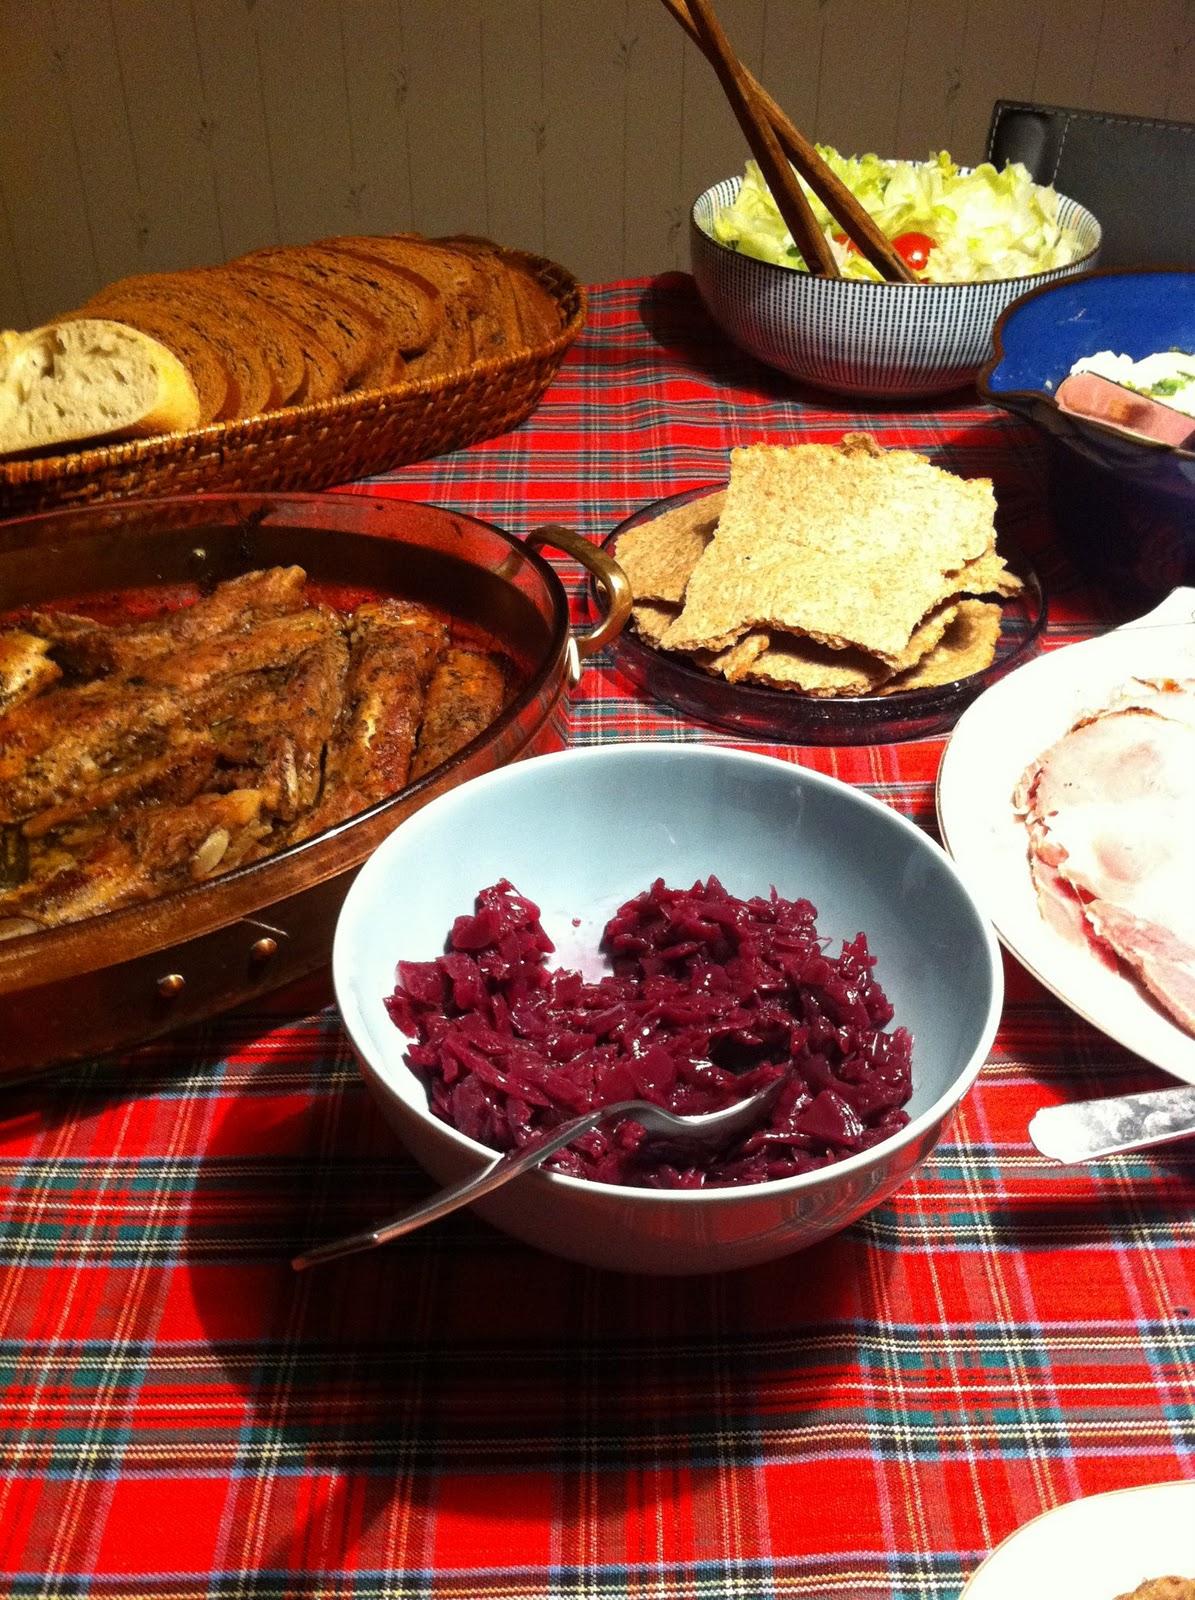 Christmas Eve Food In Spain: Maria's Food Stories: Swedish Christmas Eve Dinner